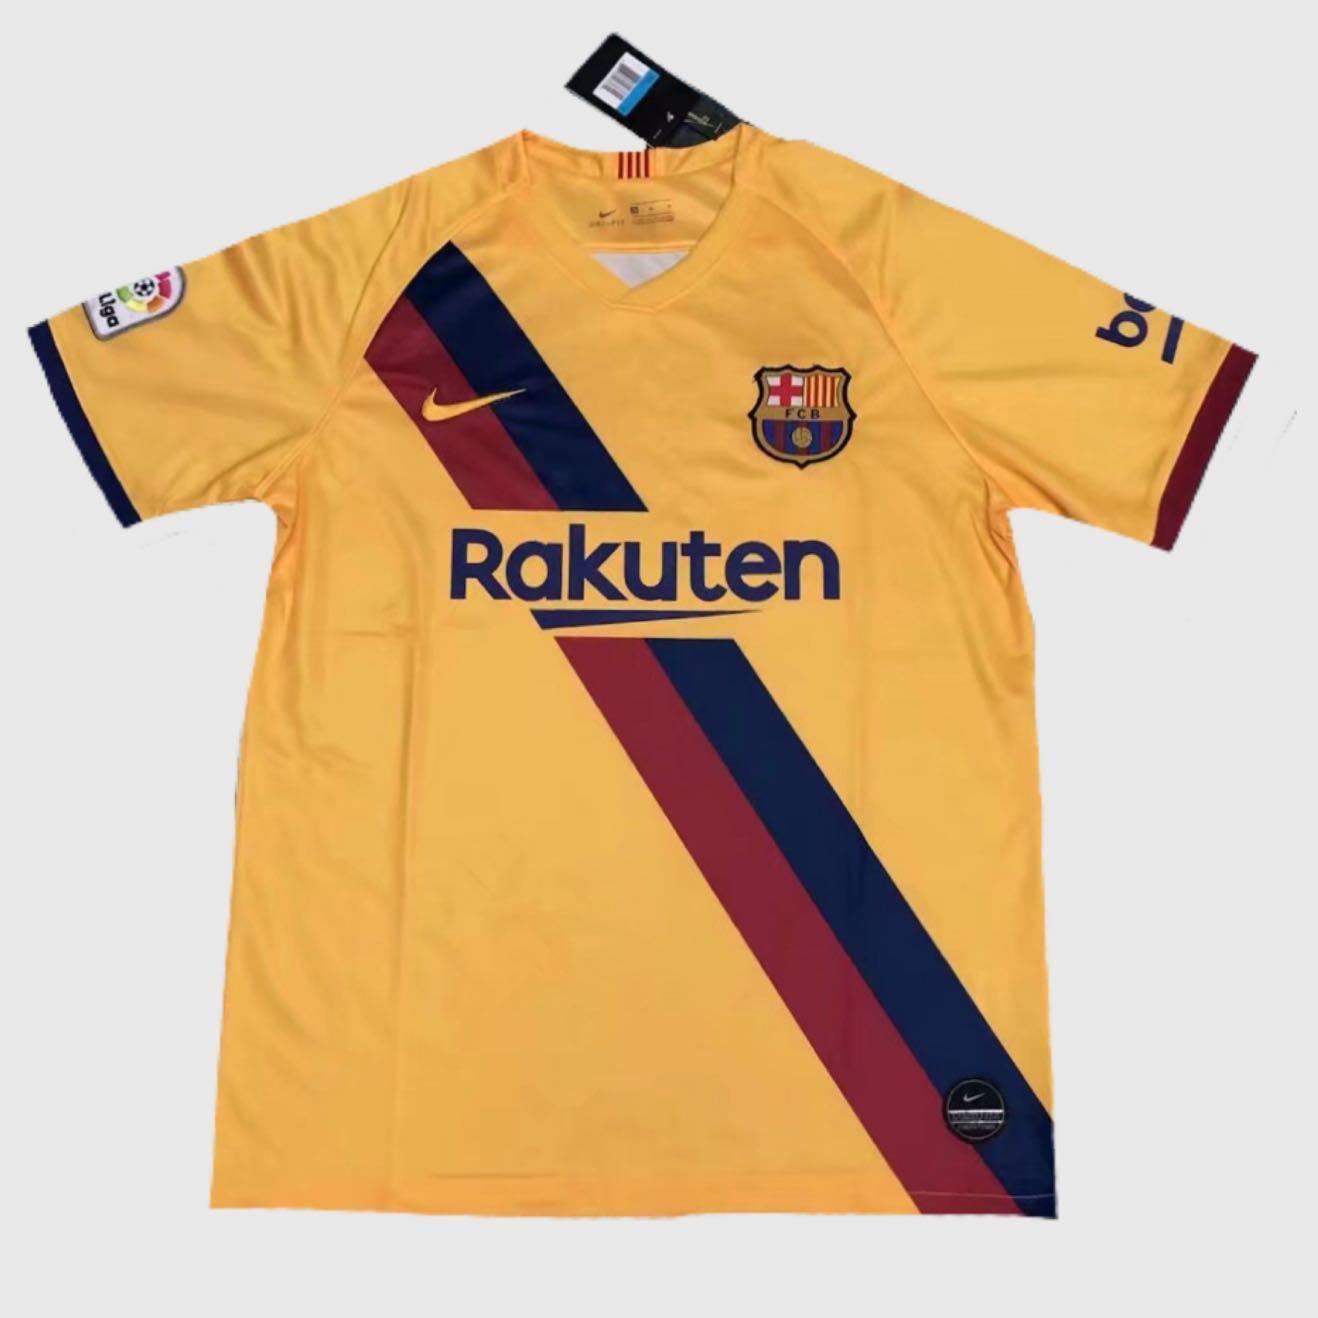 wholesale dealer 90cfc c3944 ❗️SALE❗️Barcelona 19-20 Home/Away Jersey Kits, Sports ...